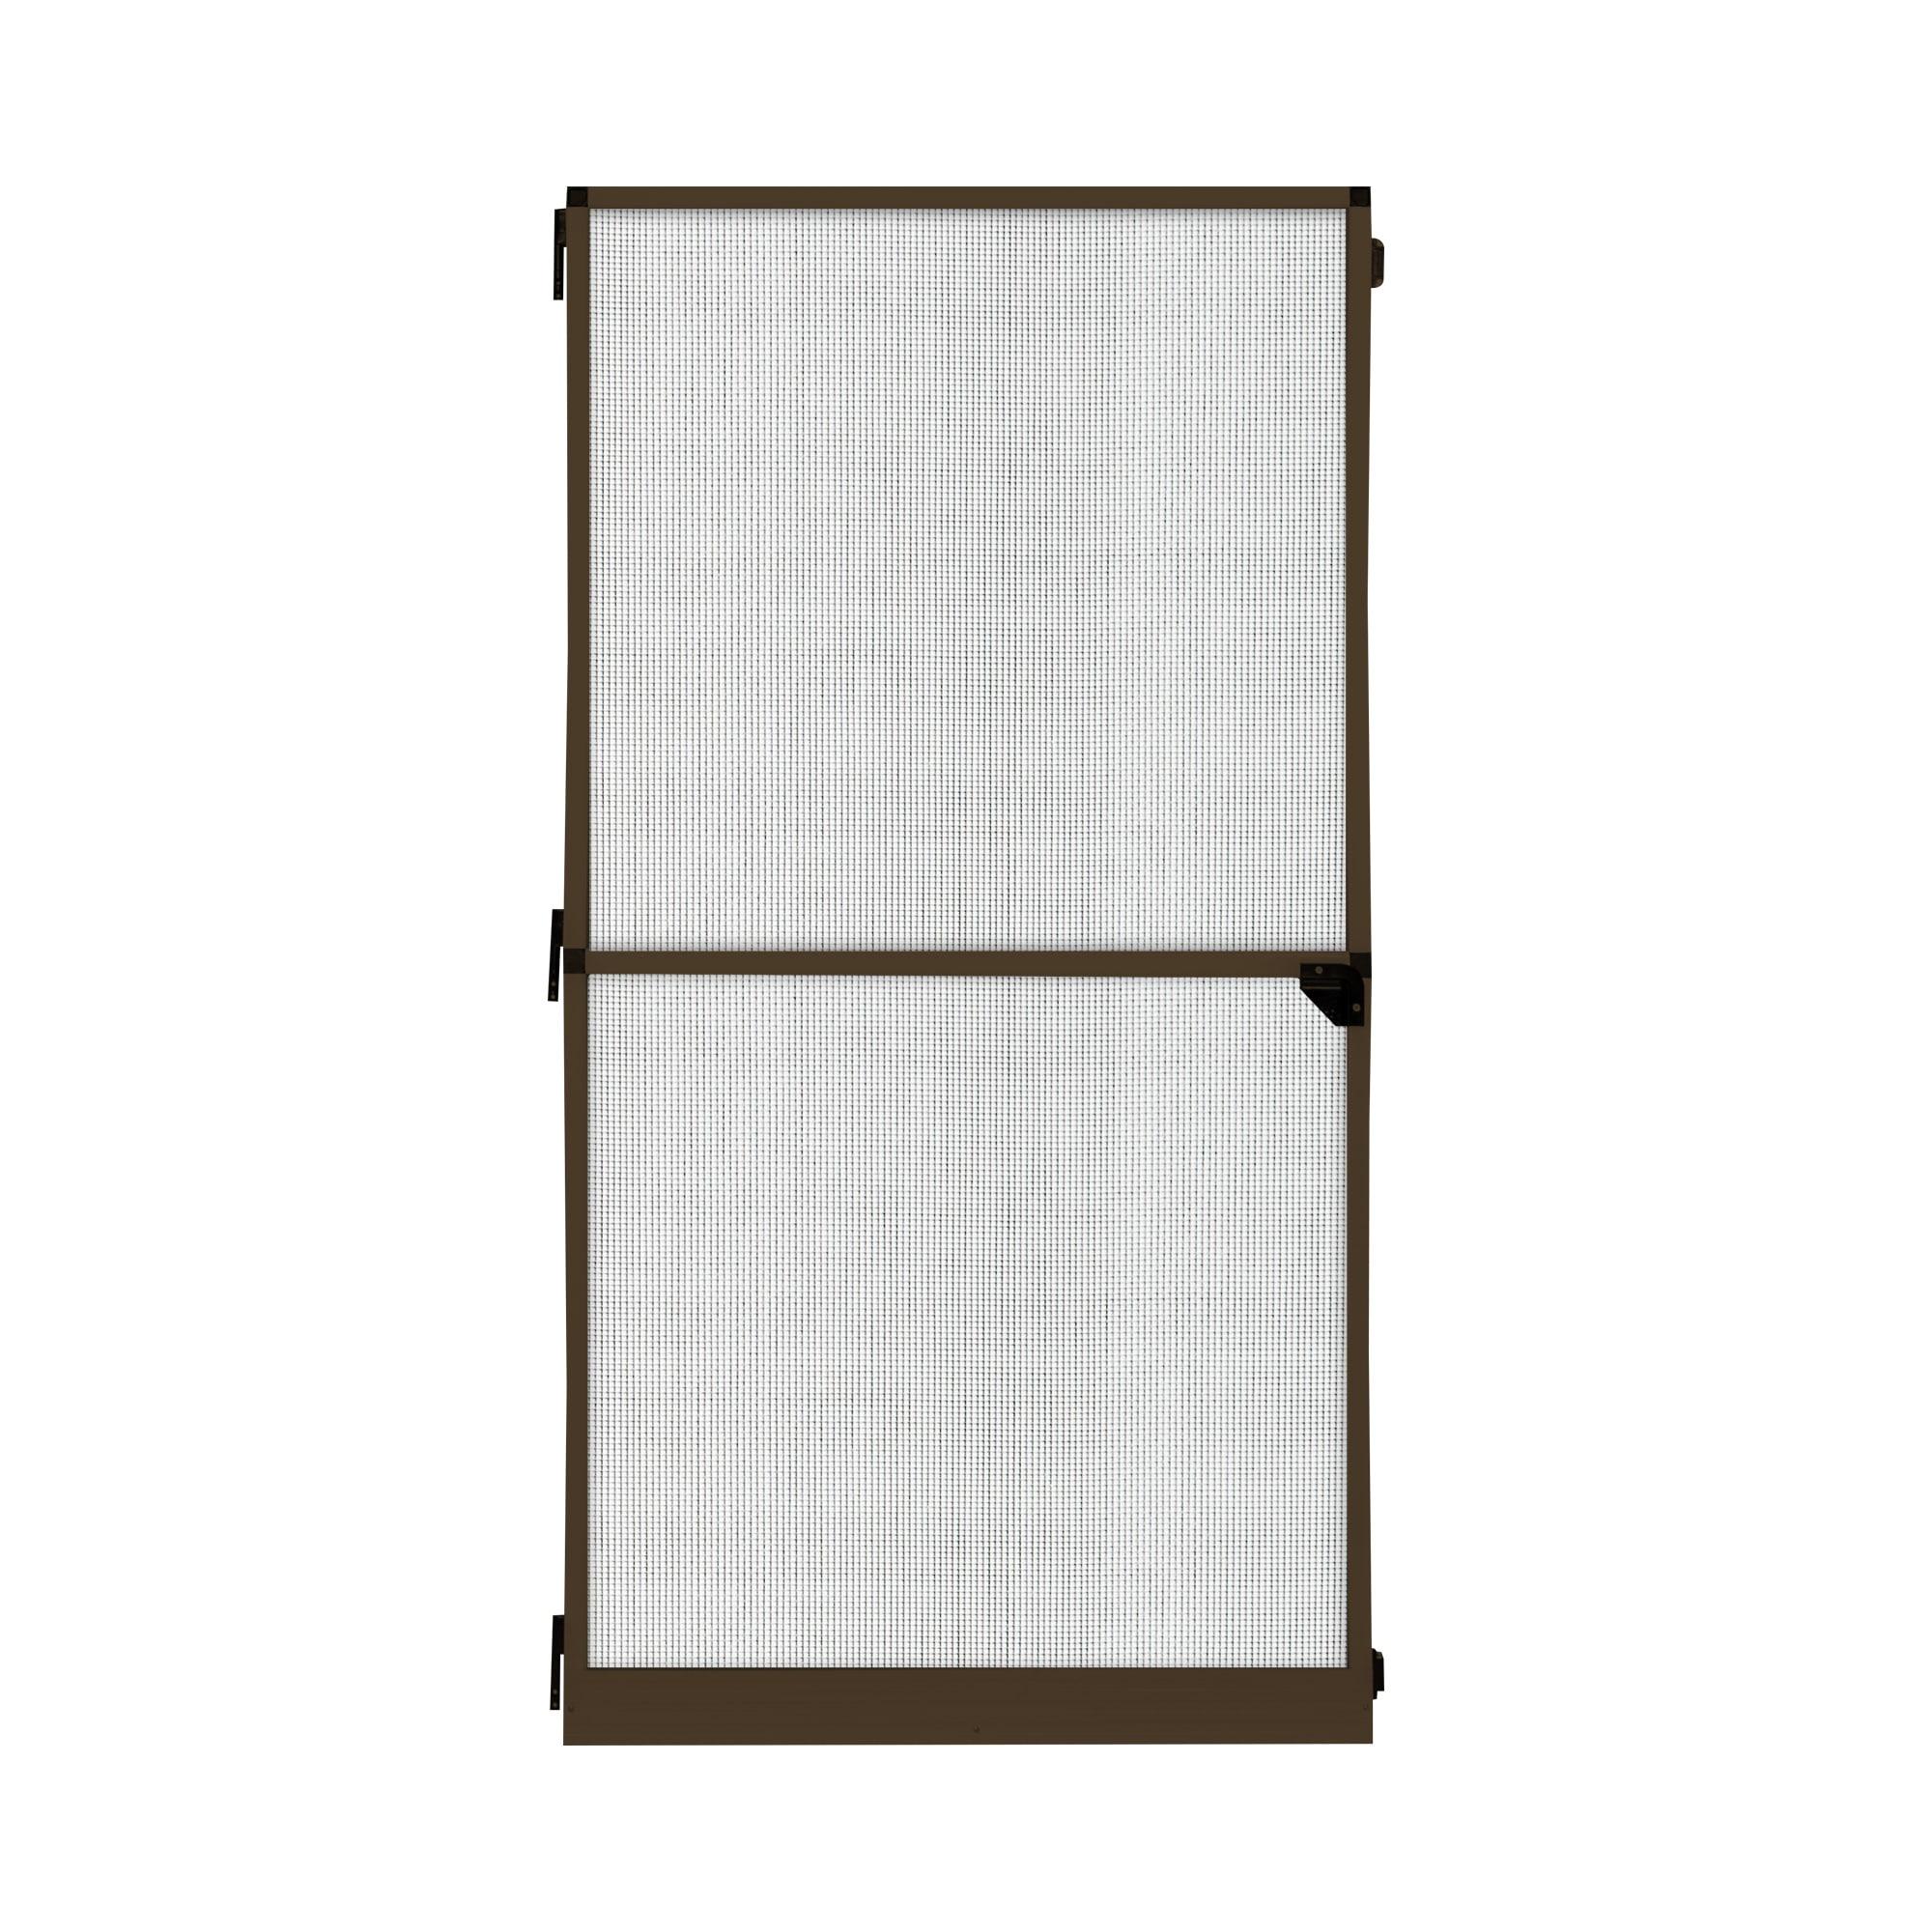 Fliegengitter-Tuerrahmen-Insektenschutz-Tuer-Drehrahmen-Rahmen-Tuergitter-120x220cm Indexbild 7